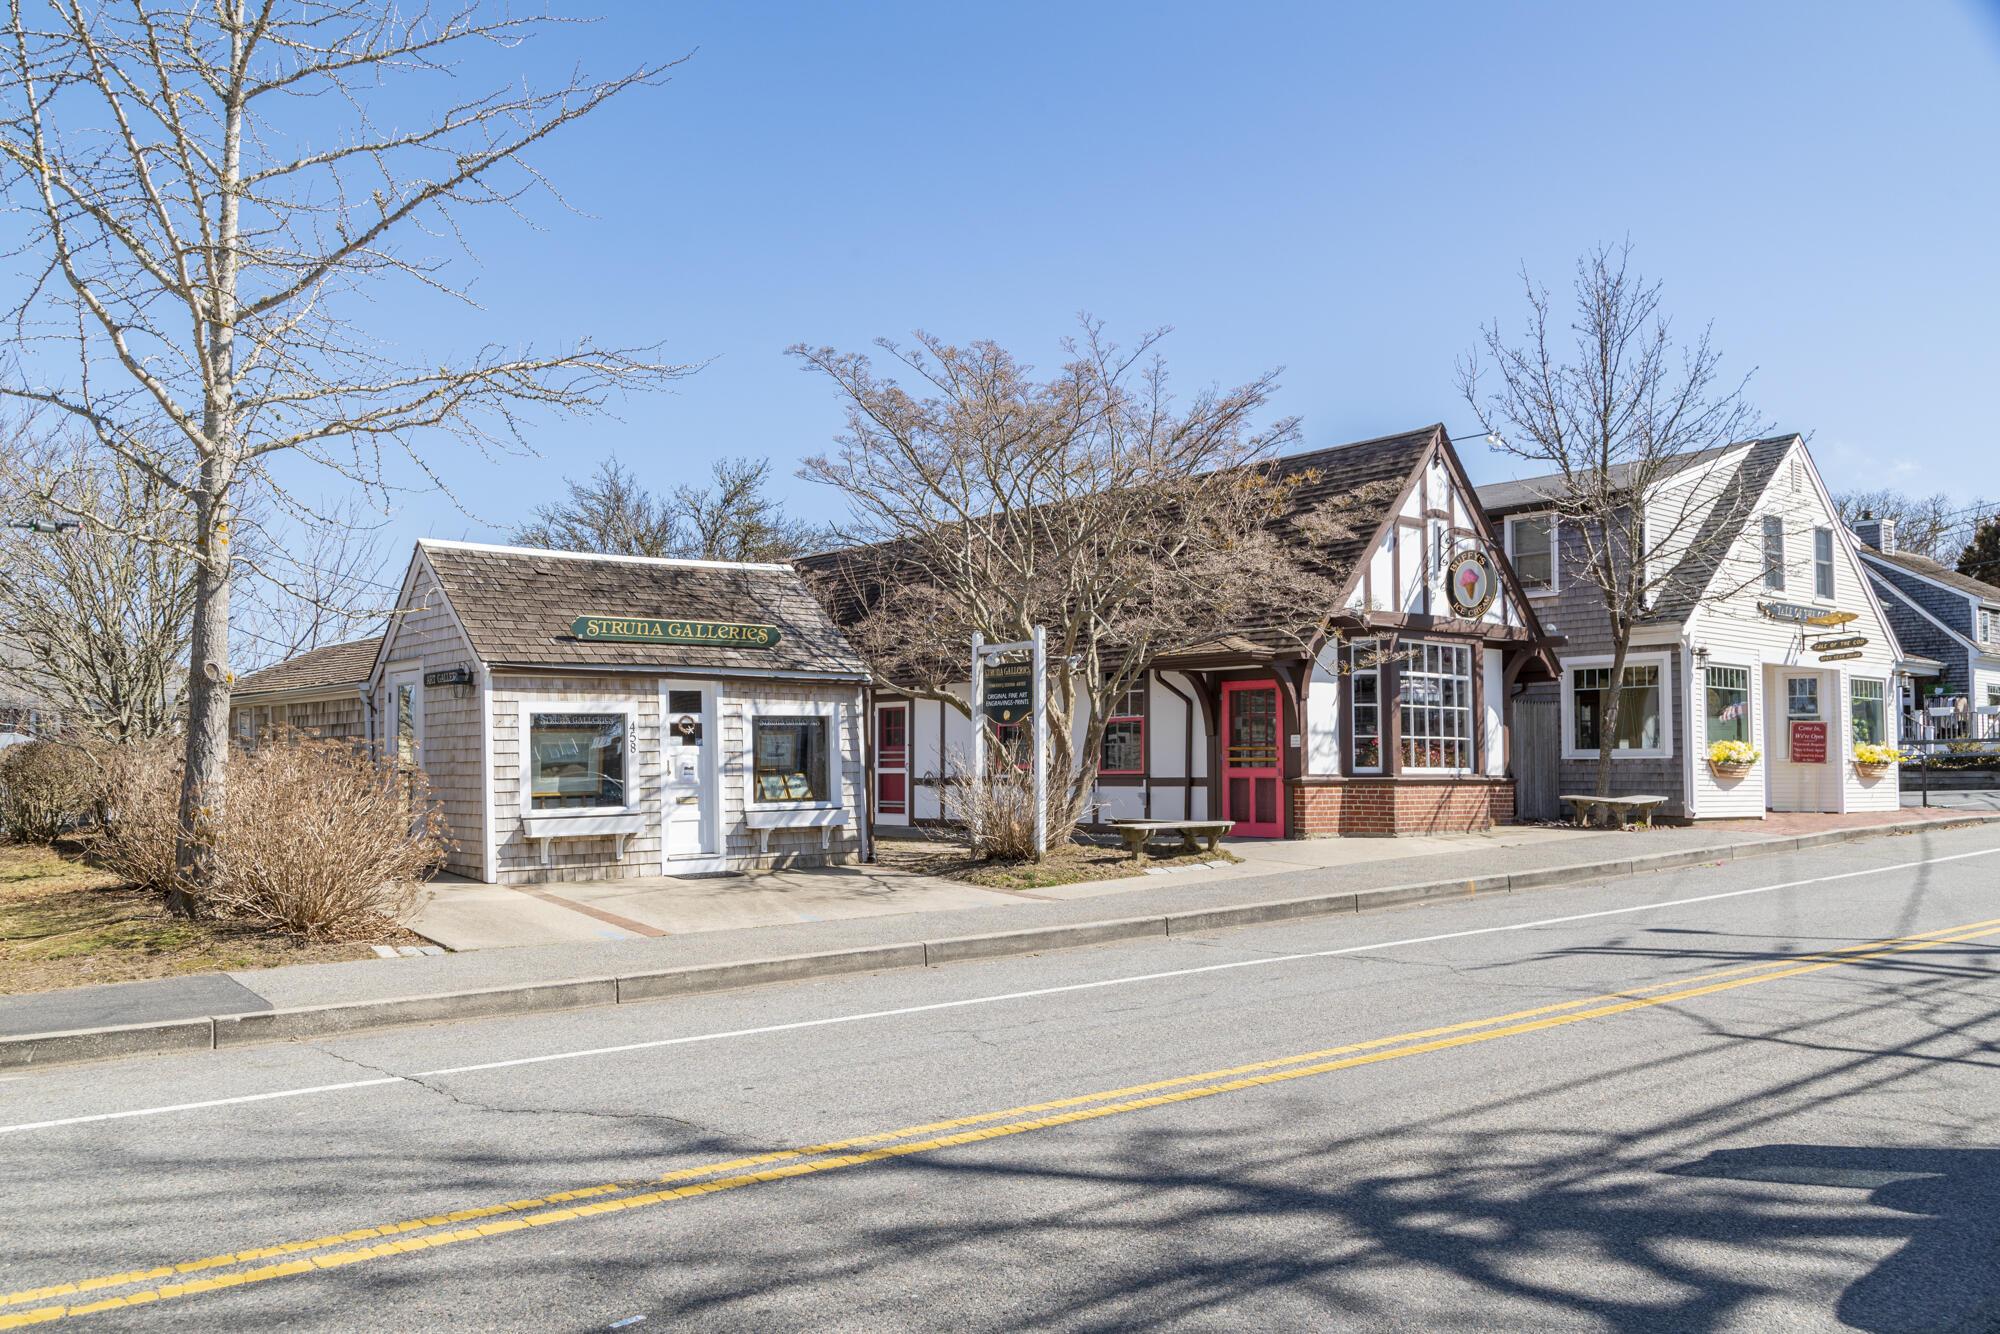 456 Main Street, Chatham MA, 02633